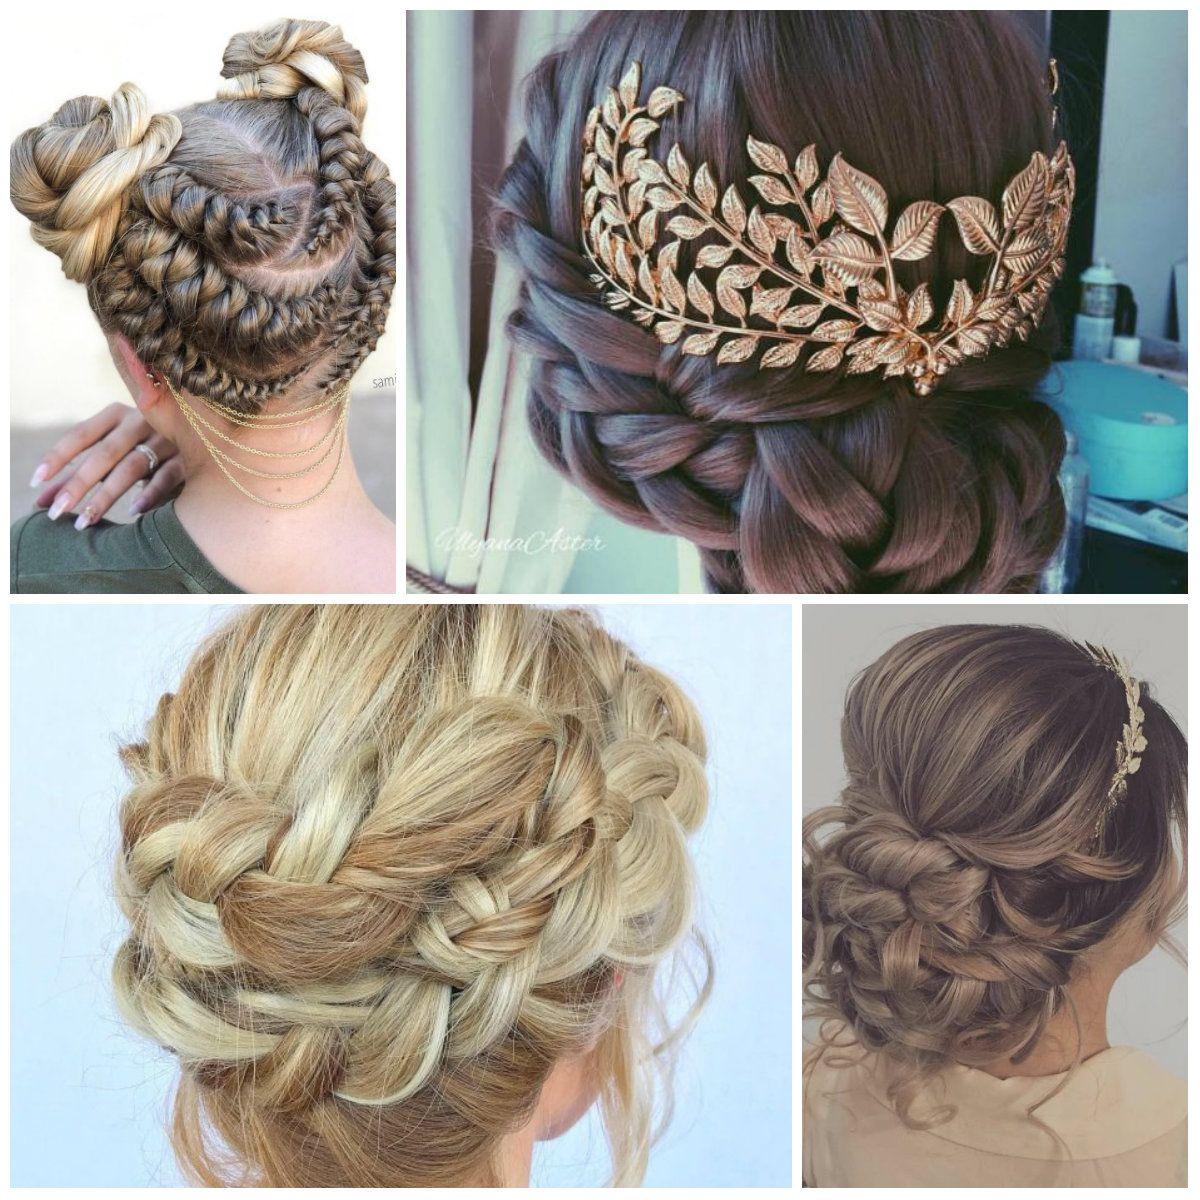 Women S Ancient Greek Hairstyles Frisuren Griechische Frisuren Frisuren Schulterlang